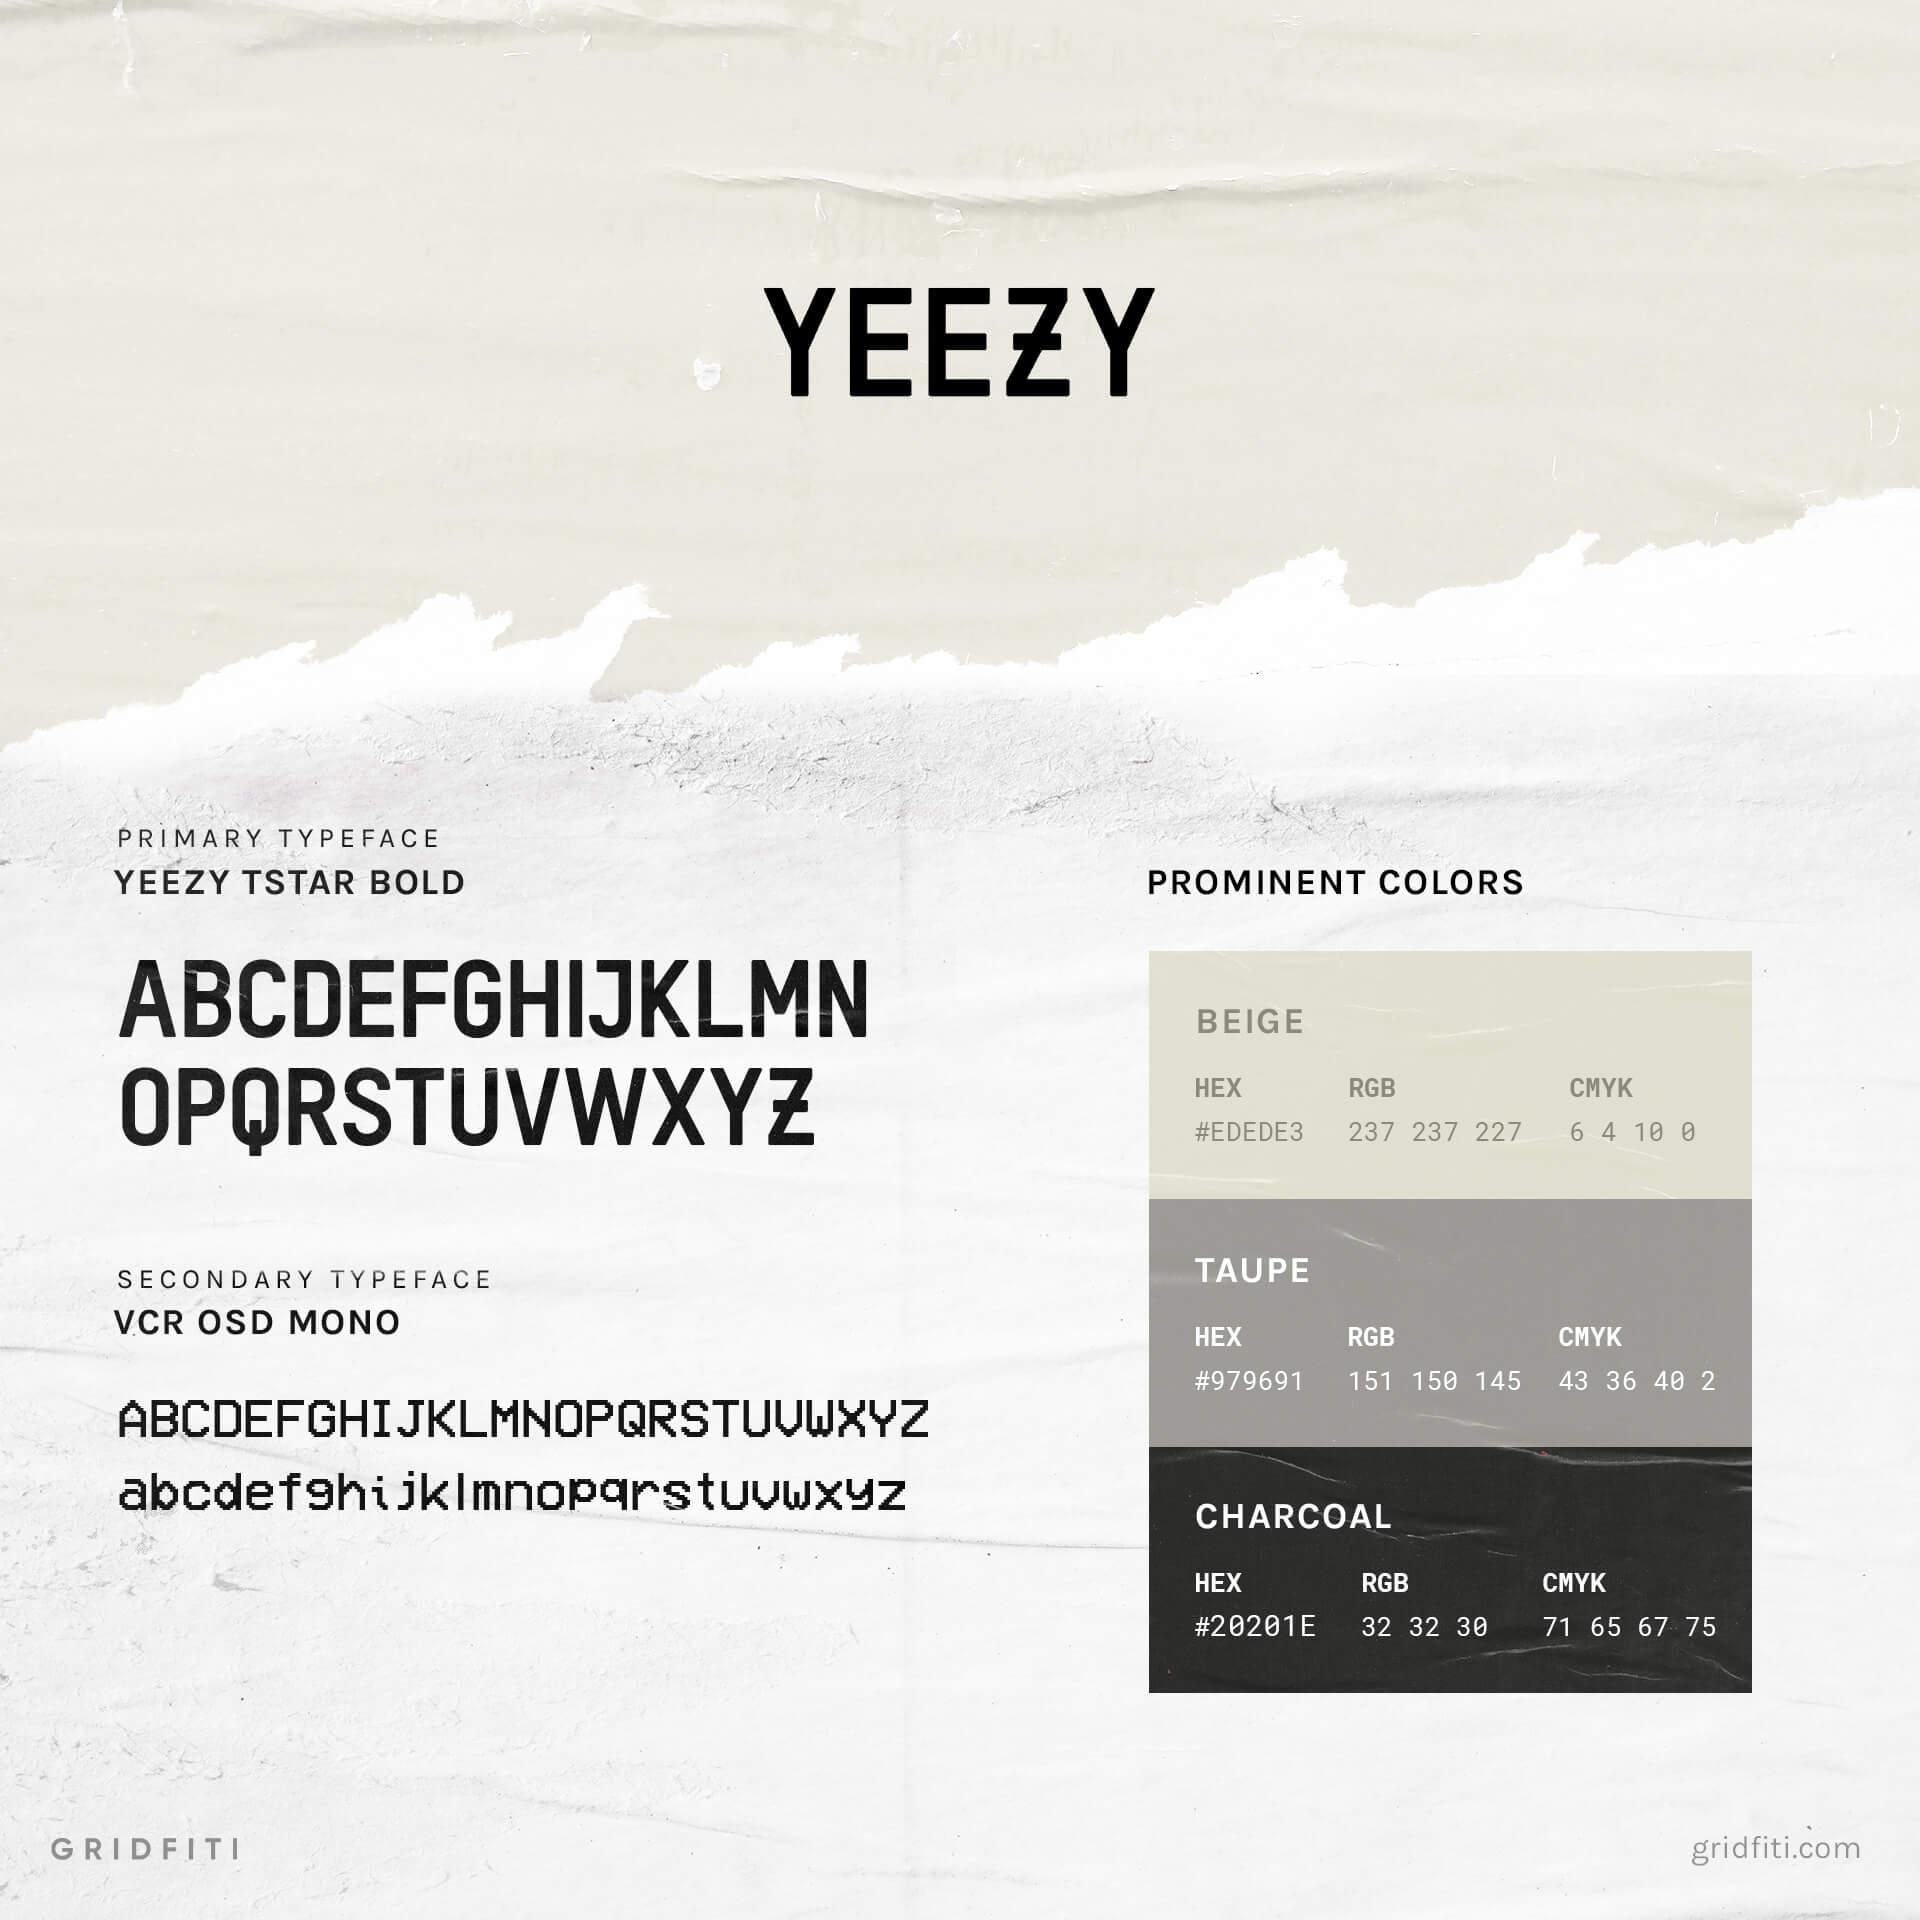 Yeezy Font & Typeface